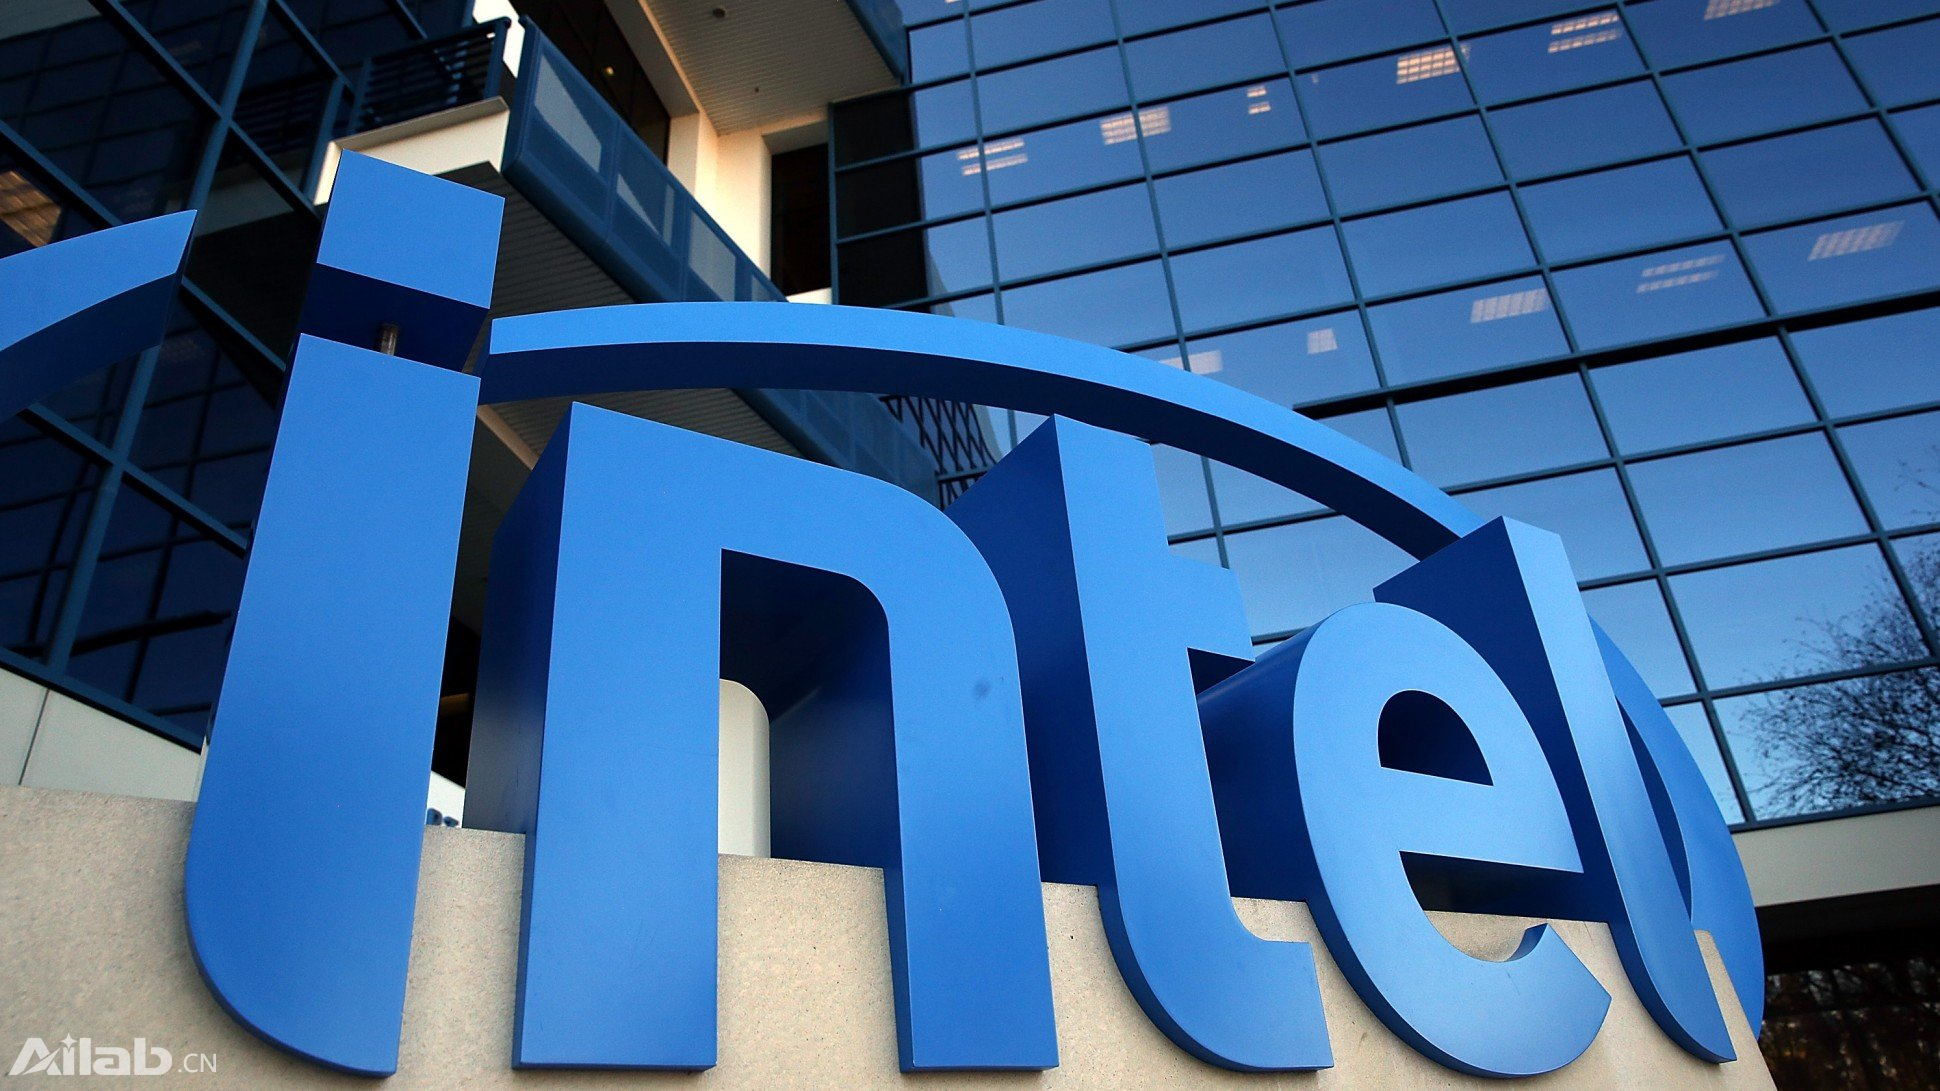 PC溃败了,转型物联网、云计算的英特尔还有一搏之力吗?